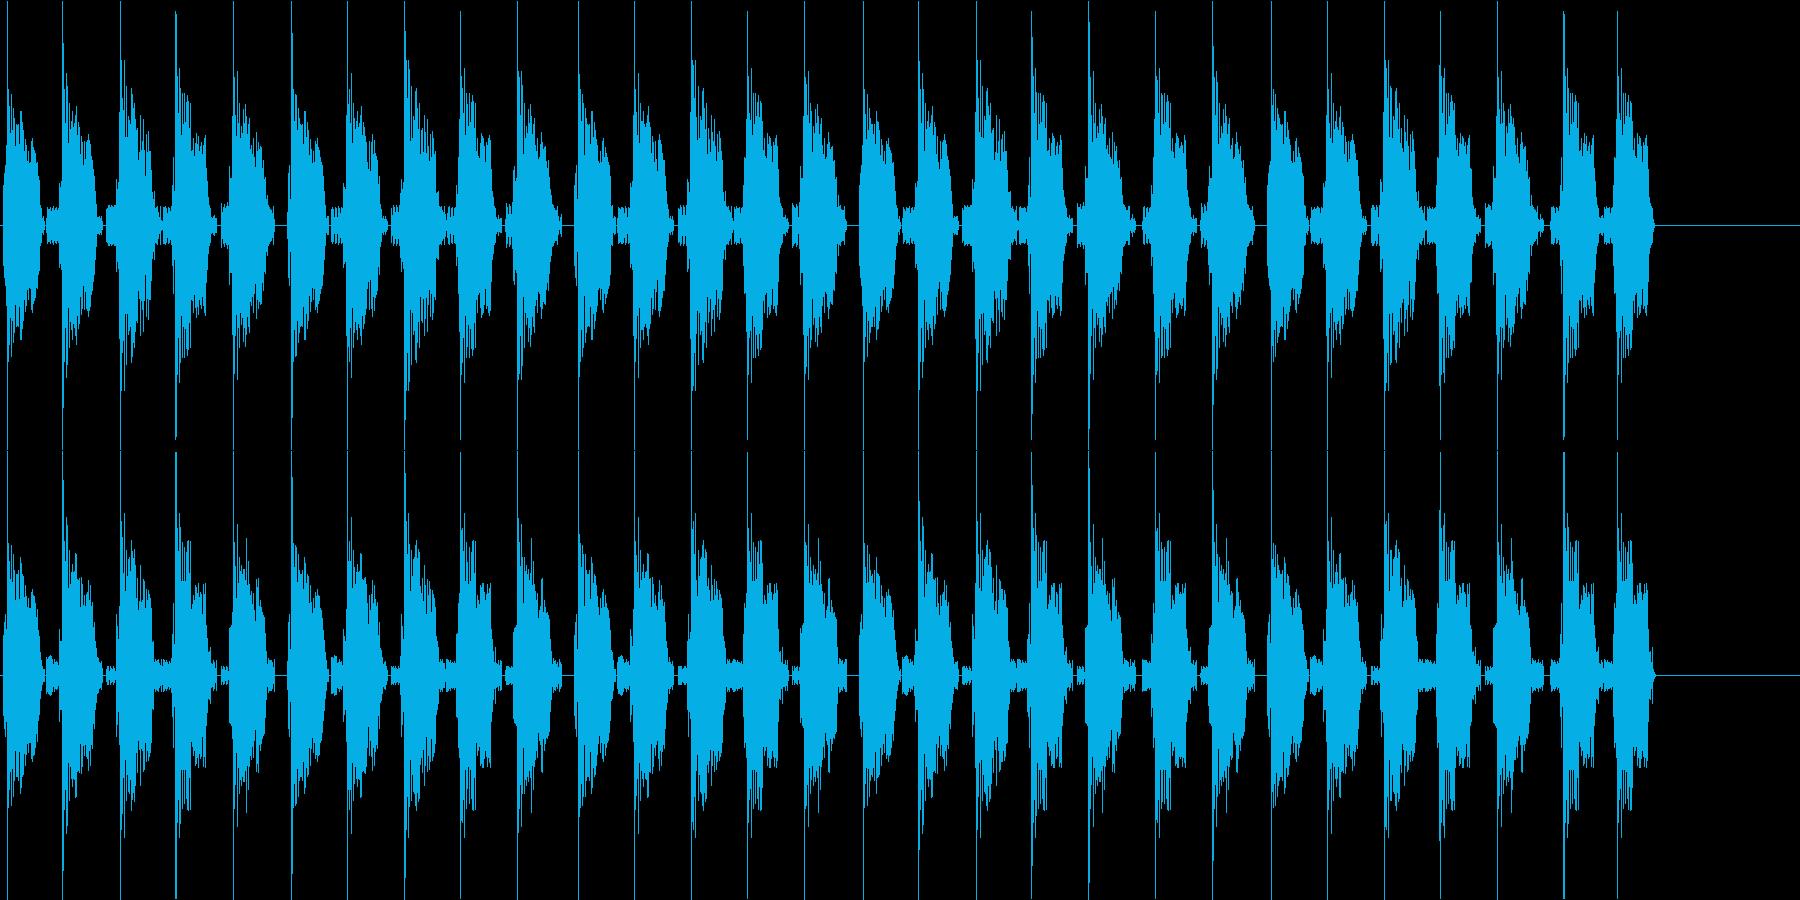 KANTププププ自主規制音1lの再生済みの波形